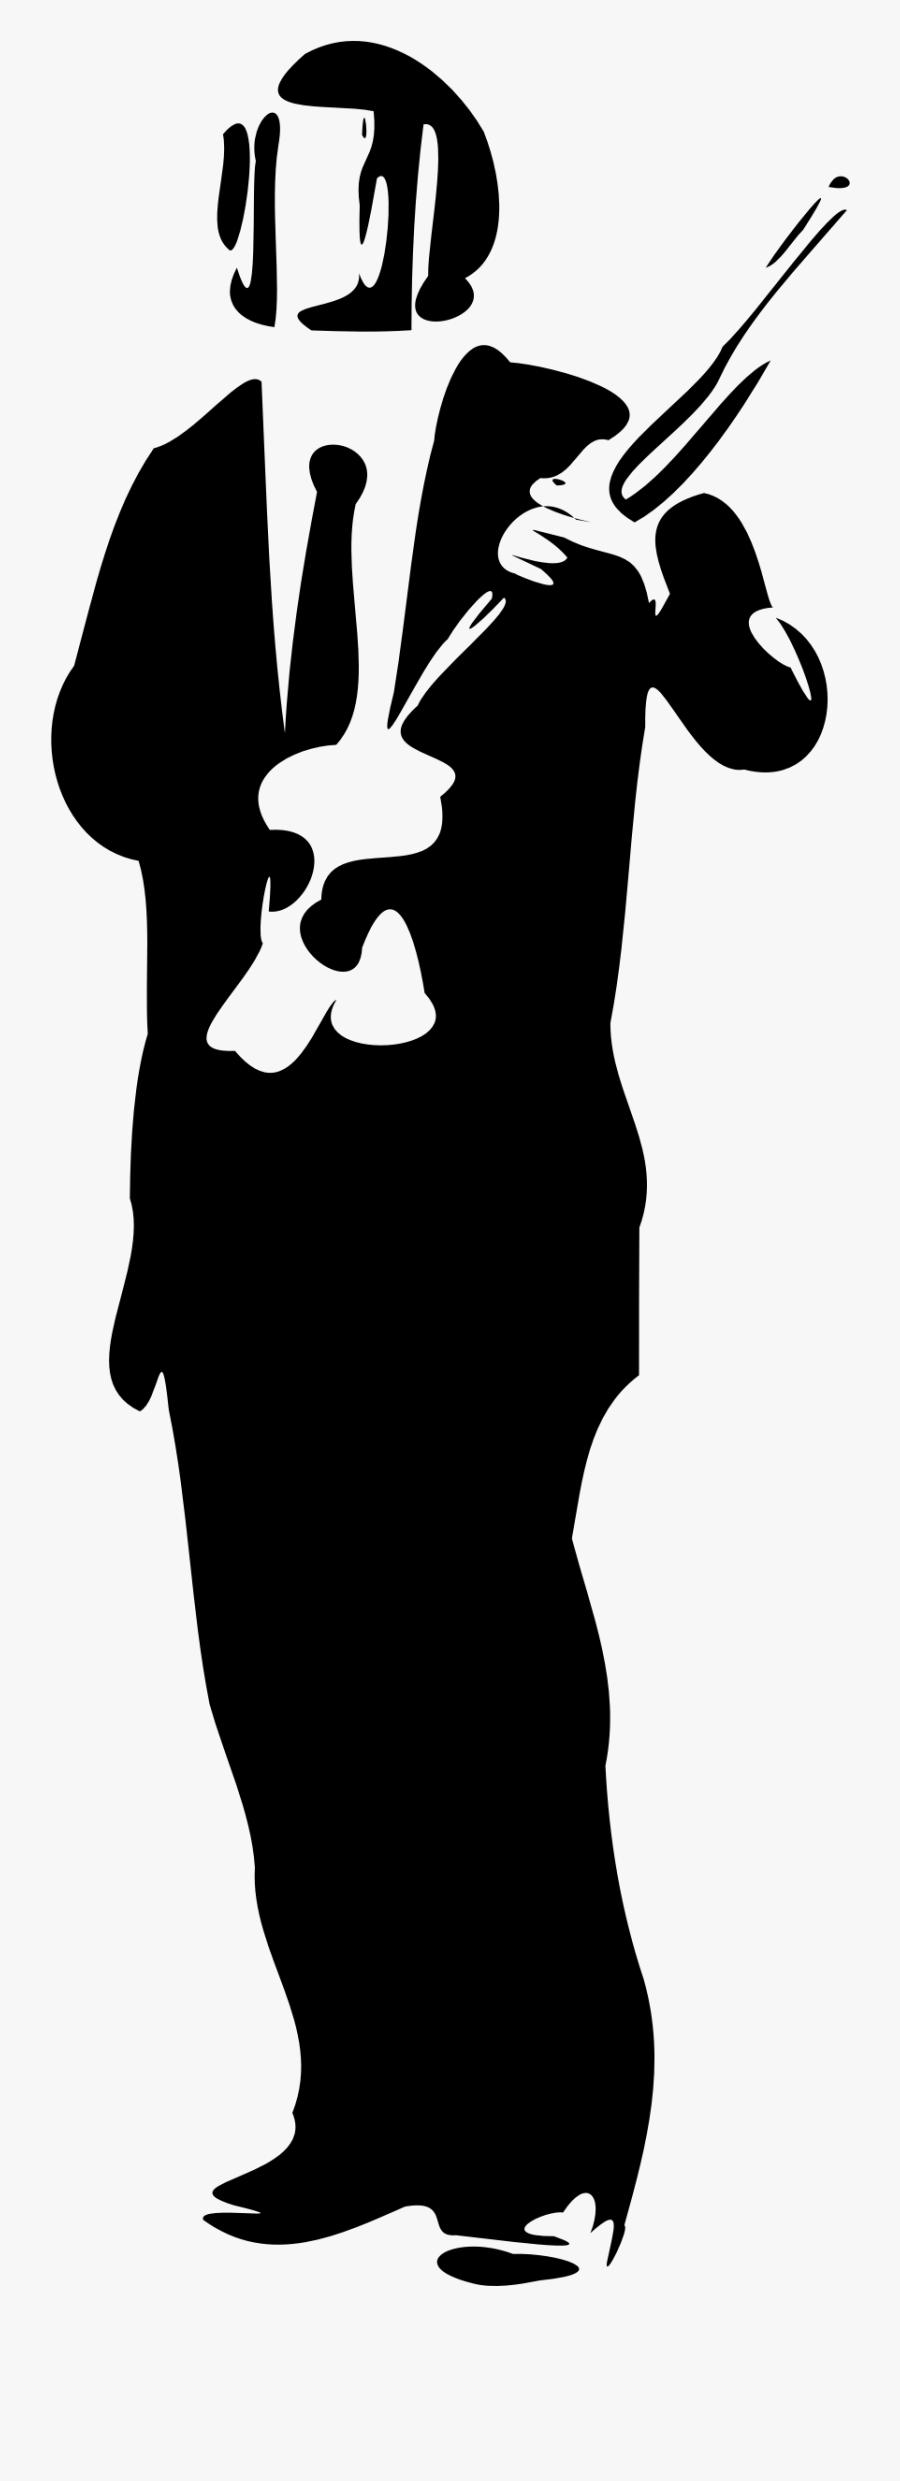 Free Clipart - Riot Silhouette, Transparent Clipart